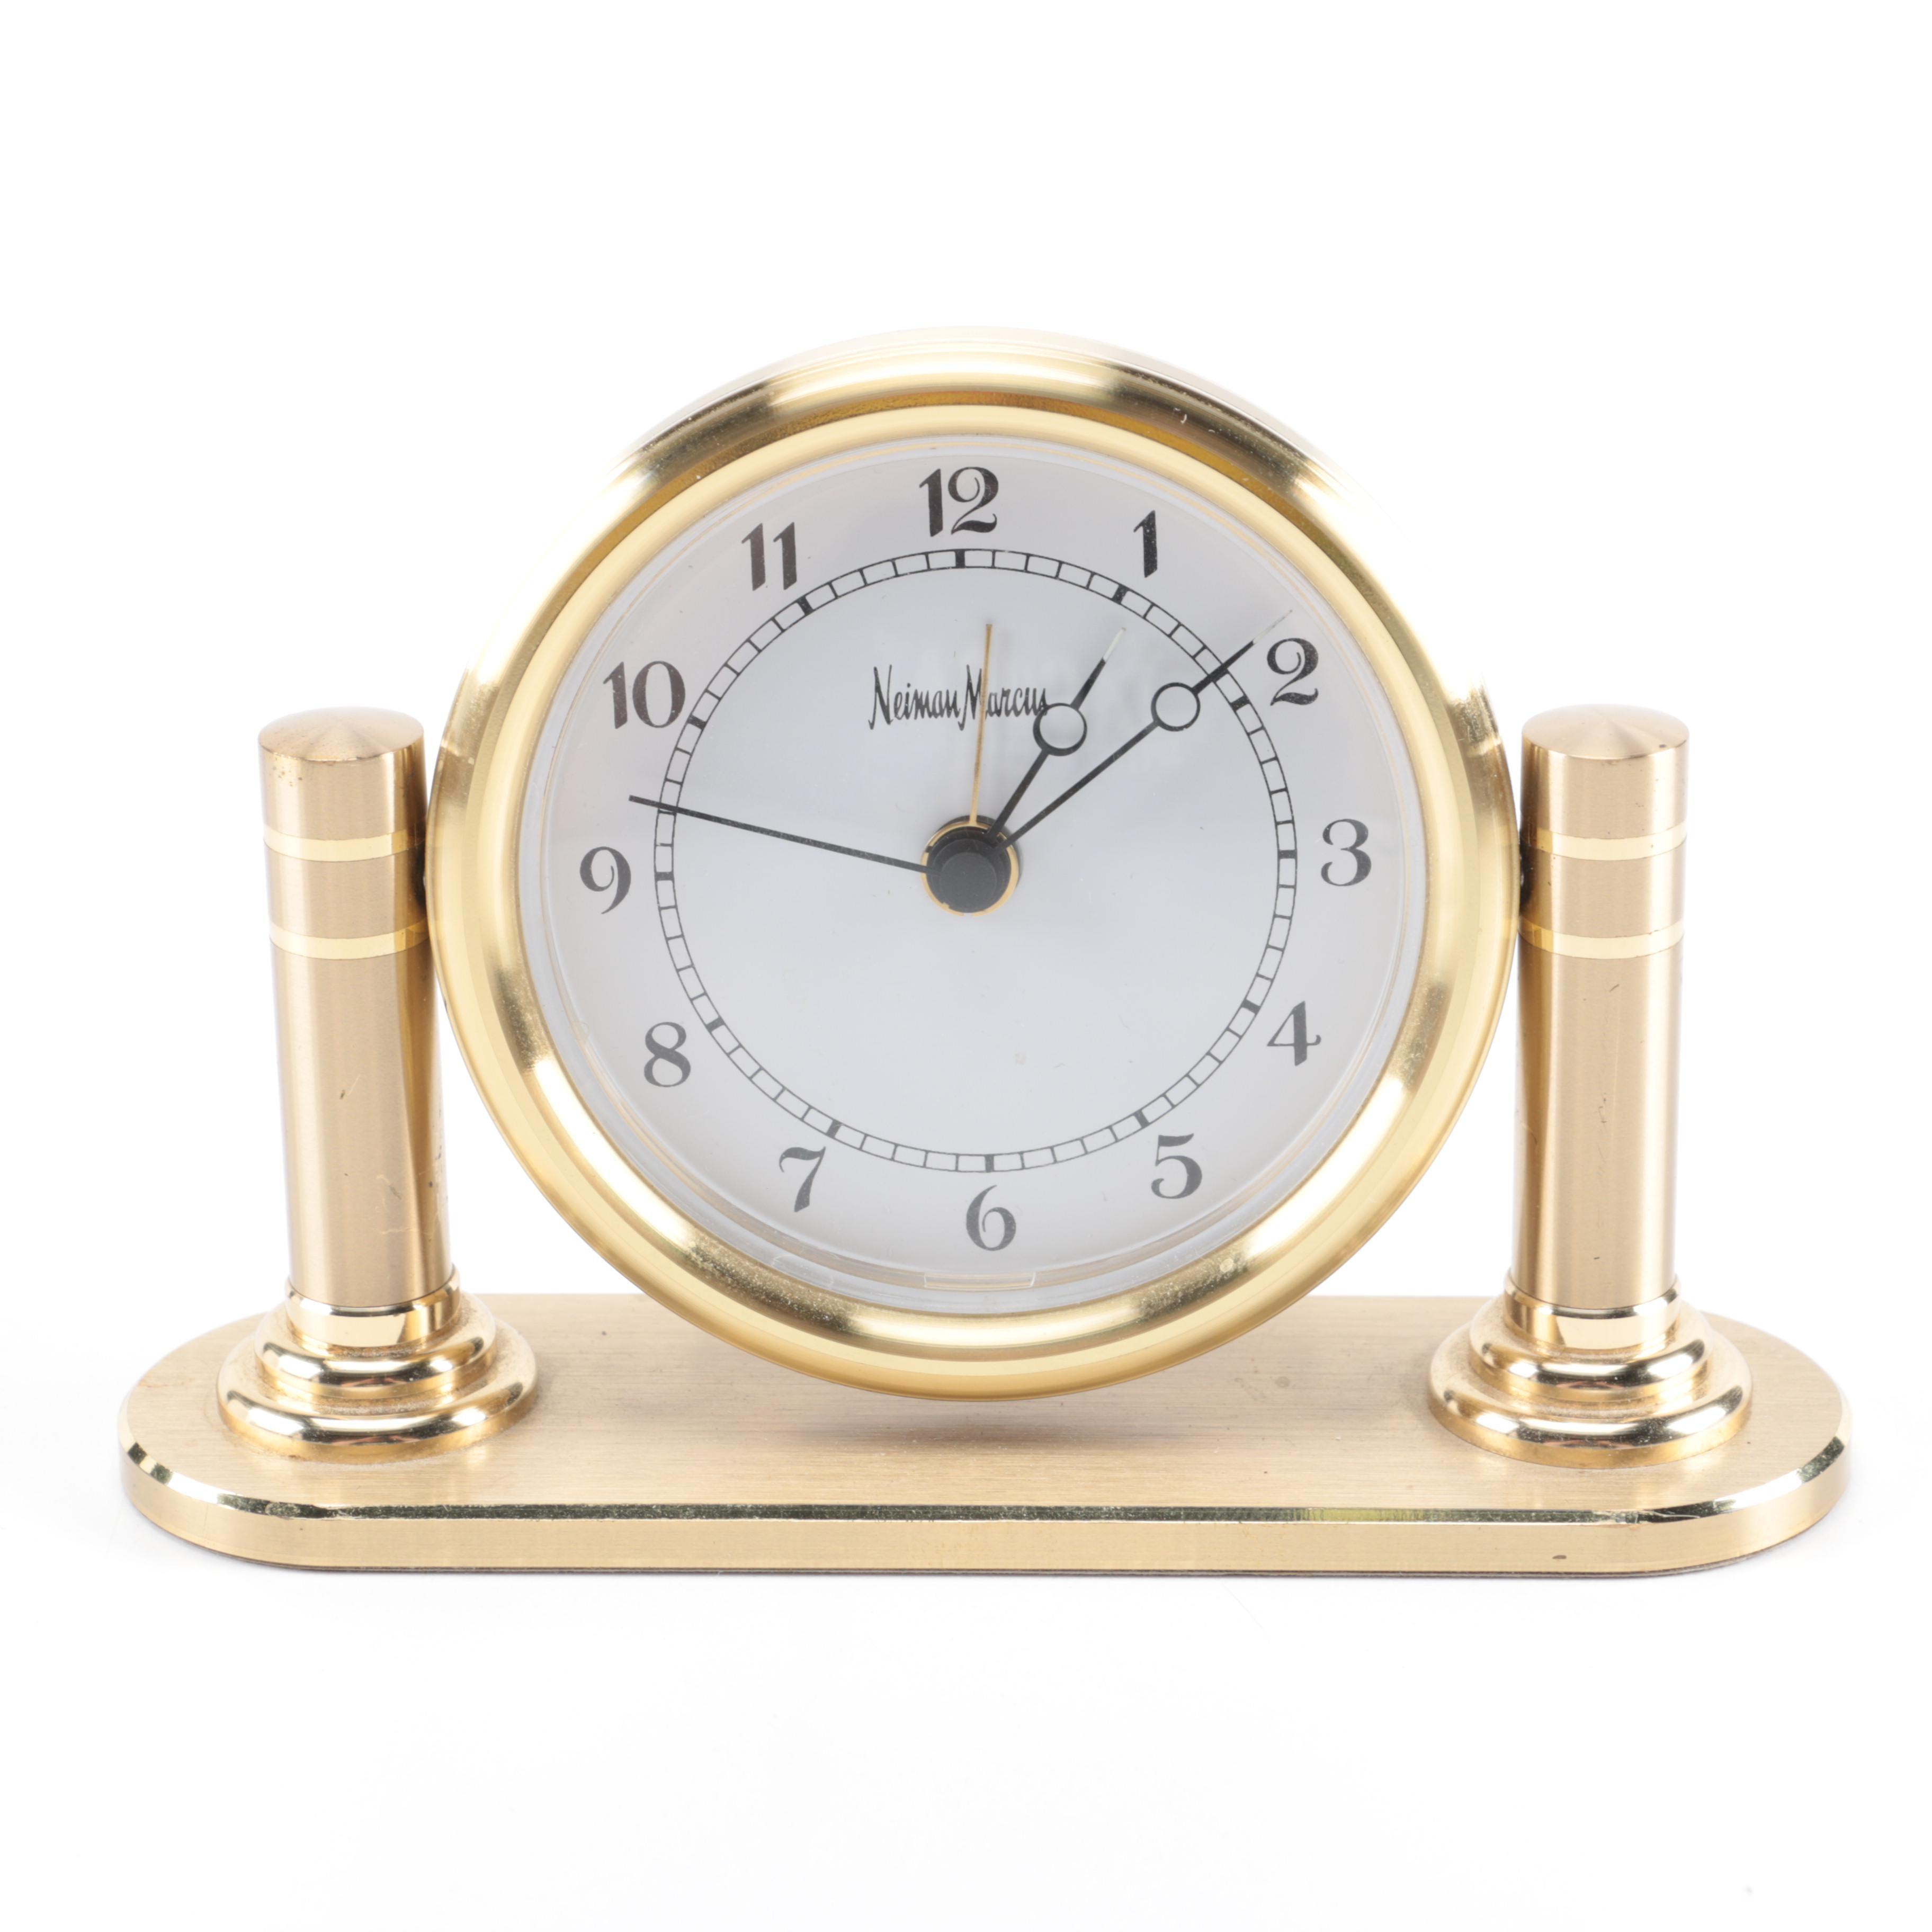 Neiman Marcus Mantel Clock